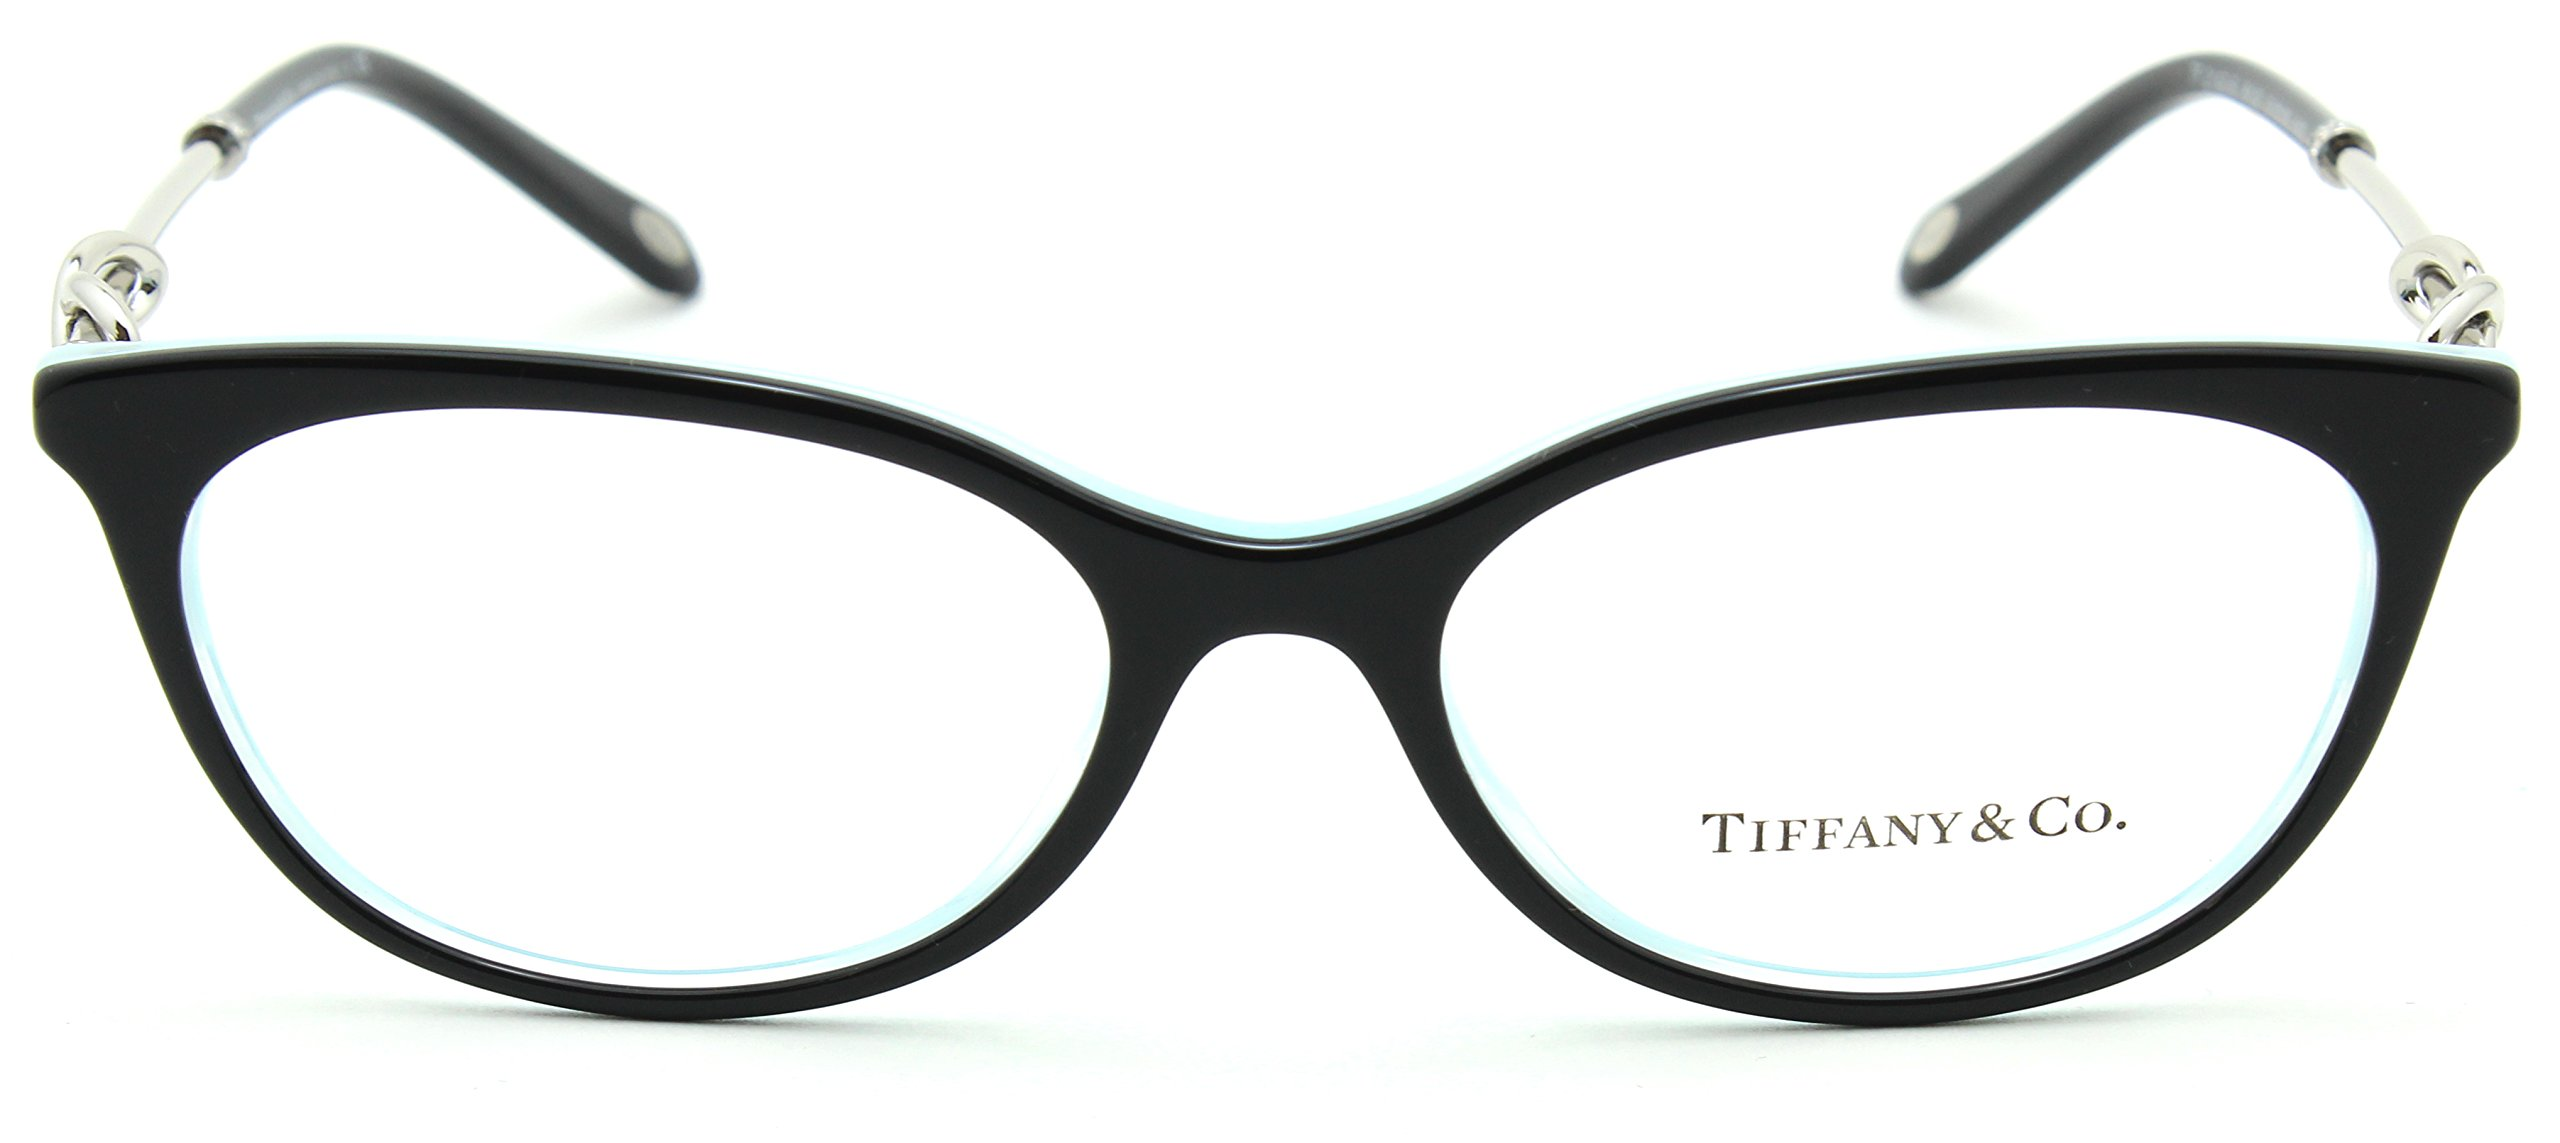 Tiffany & Co. TF 2142-B Women Eyeglasses RX - able Frame (BLACK/STRIPED BLUE 8193, 51) by Tiffany & Co. (Image #2)